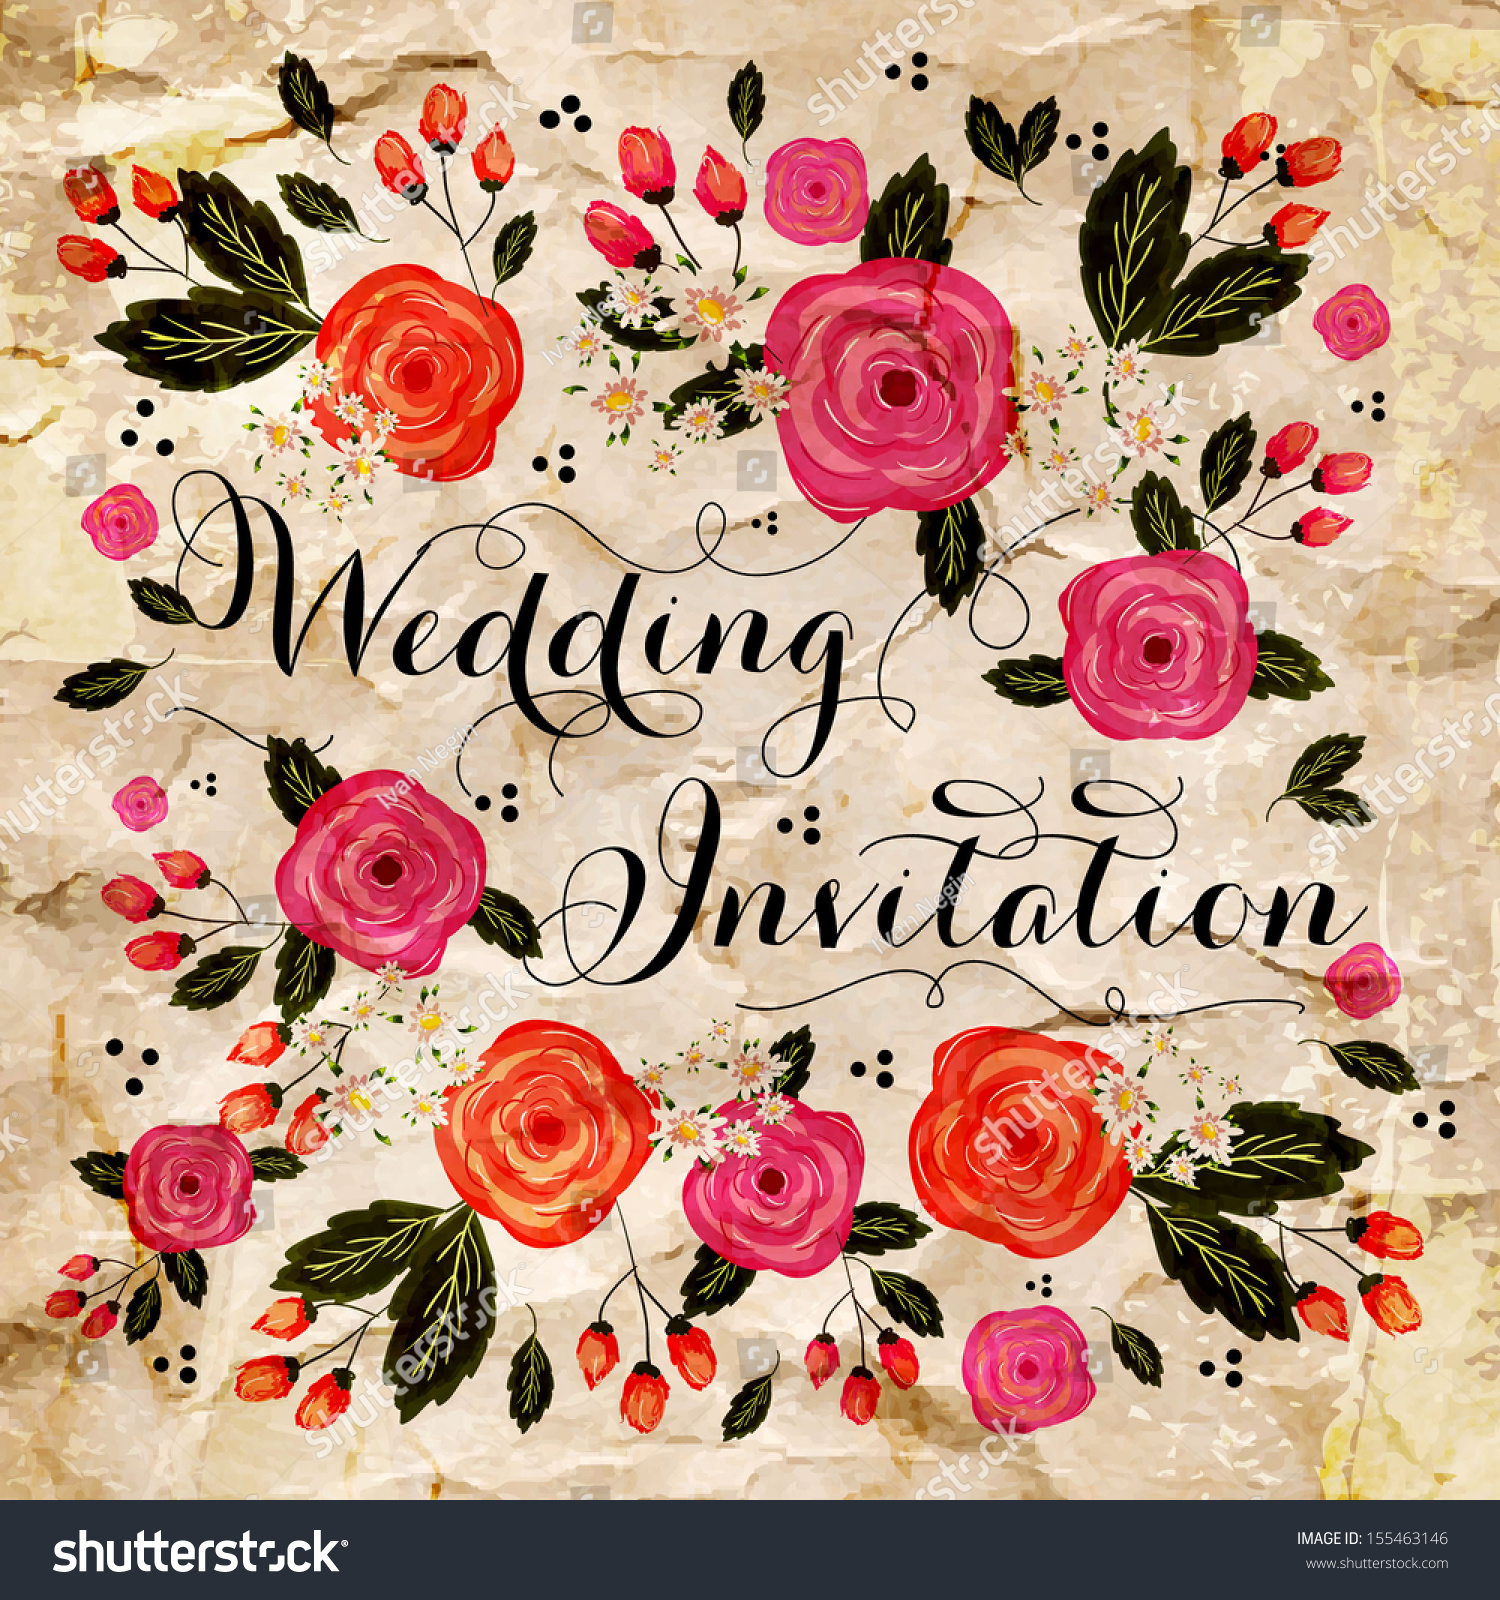 Wedding Invitation Card Stock Vector (Royalty Free) 155463146 ...